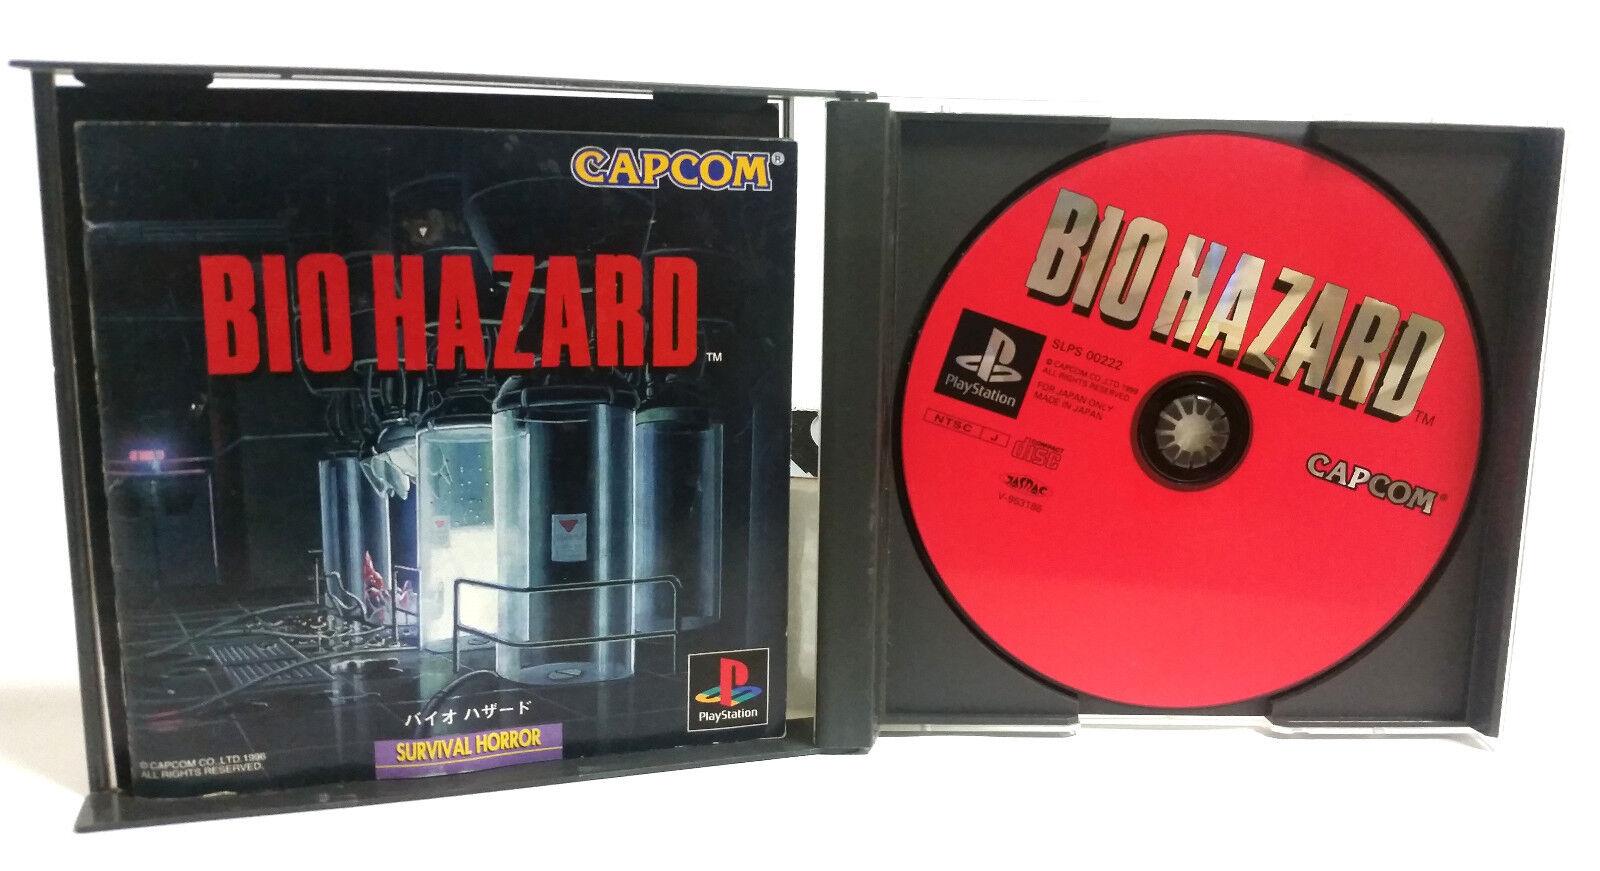 Biohazard Ps1 Resident Evil Survival Horror Japanese Import Used Revelations Ps4 Region 3 English 2 Of